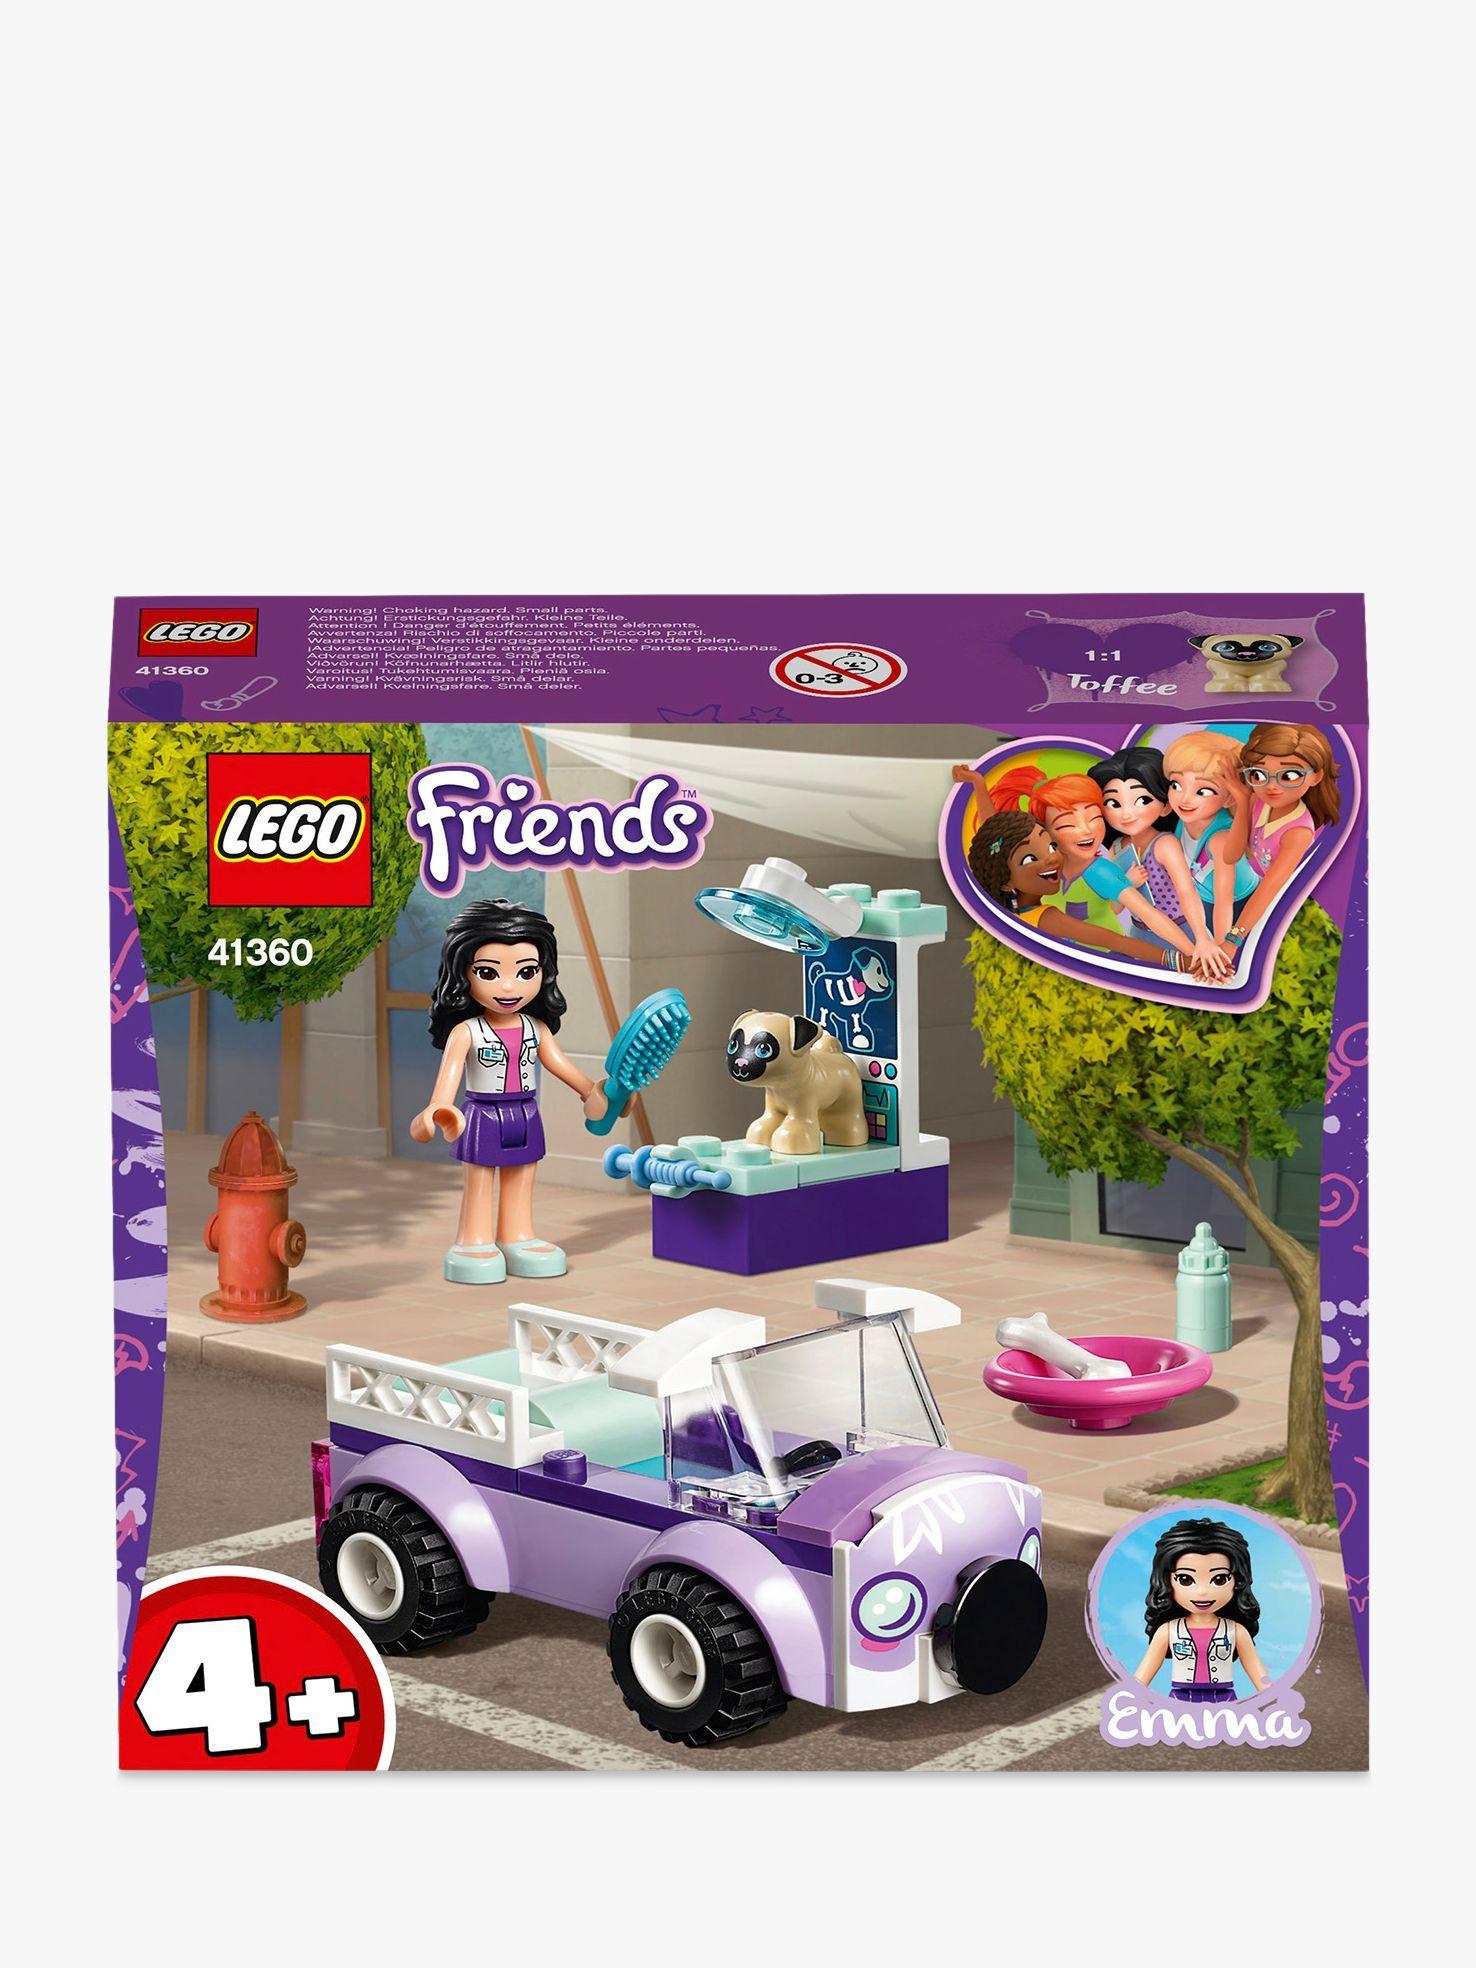 41360 LEGO FRIENDS Emma/'s Mobile Vet Clinic Playset